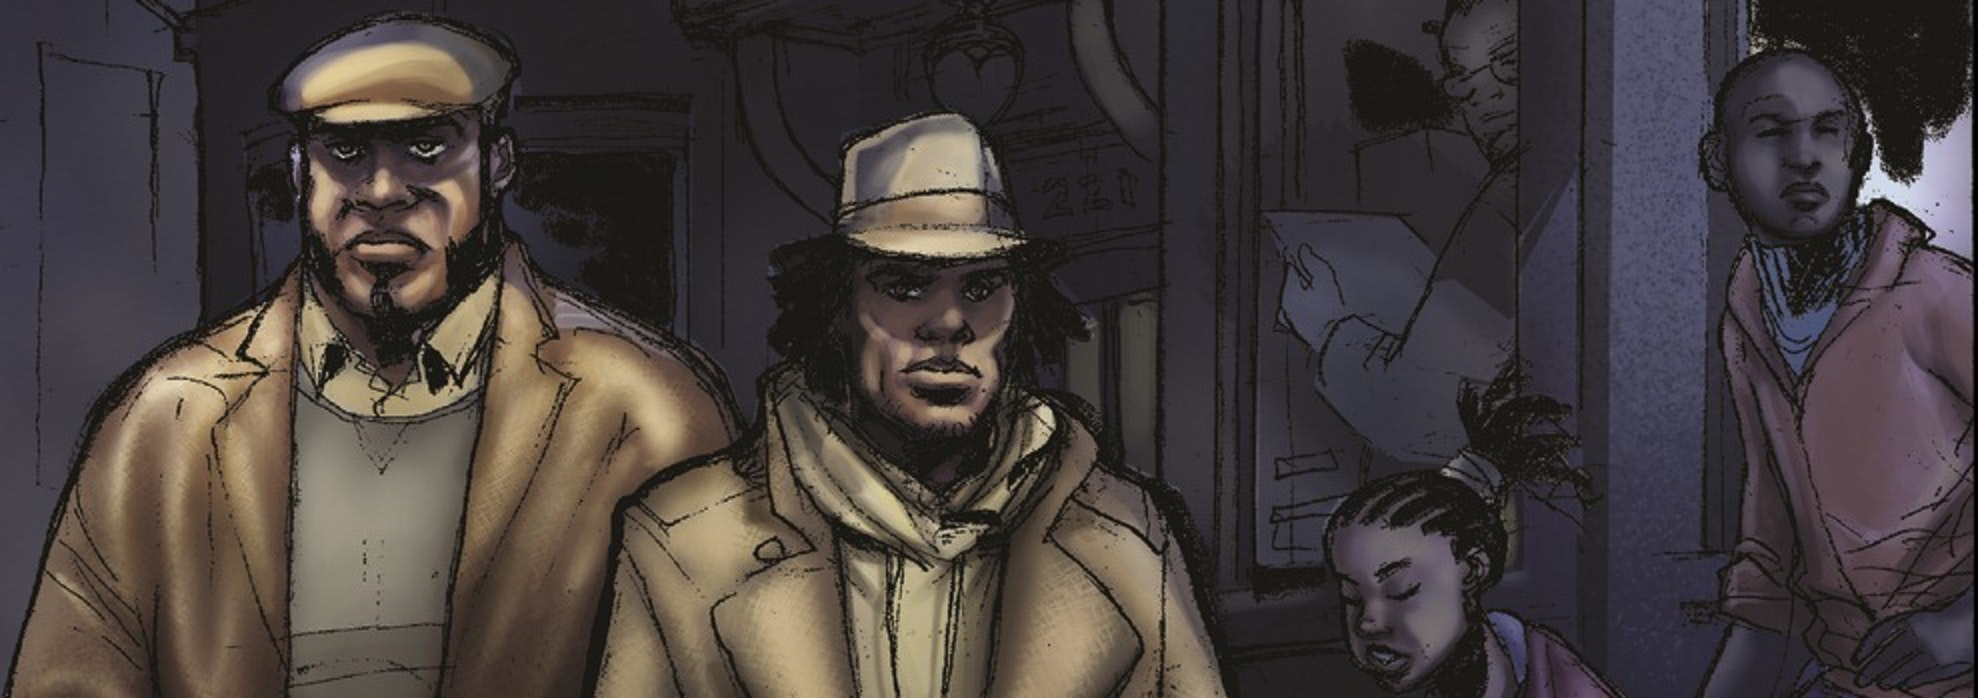 Rick Leonardi, Karl Bowers and Paul J. Mendoza's 'Watson & Holmes'